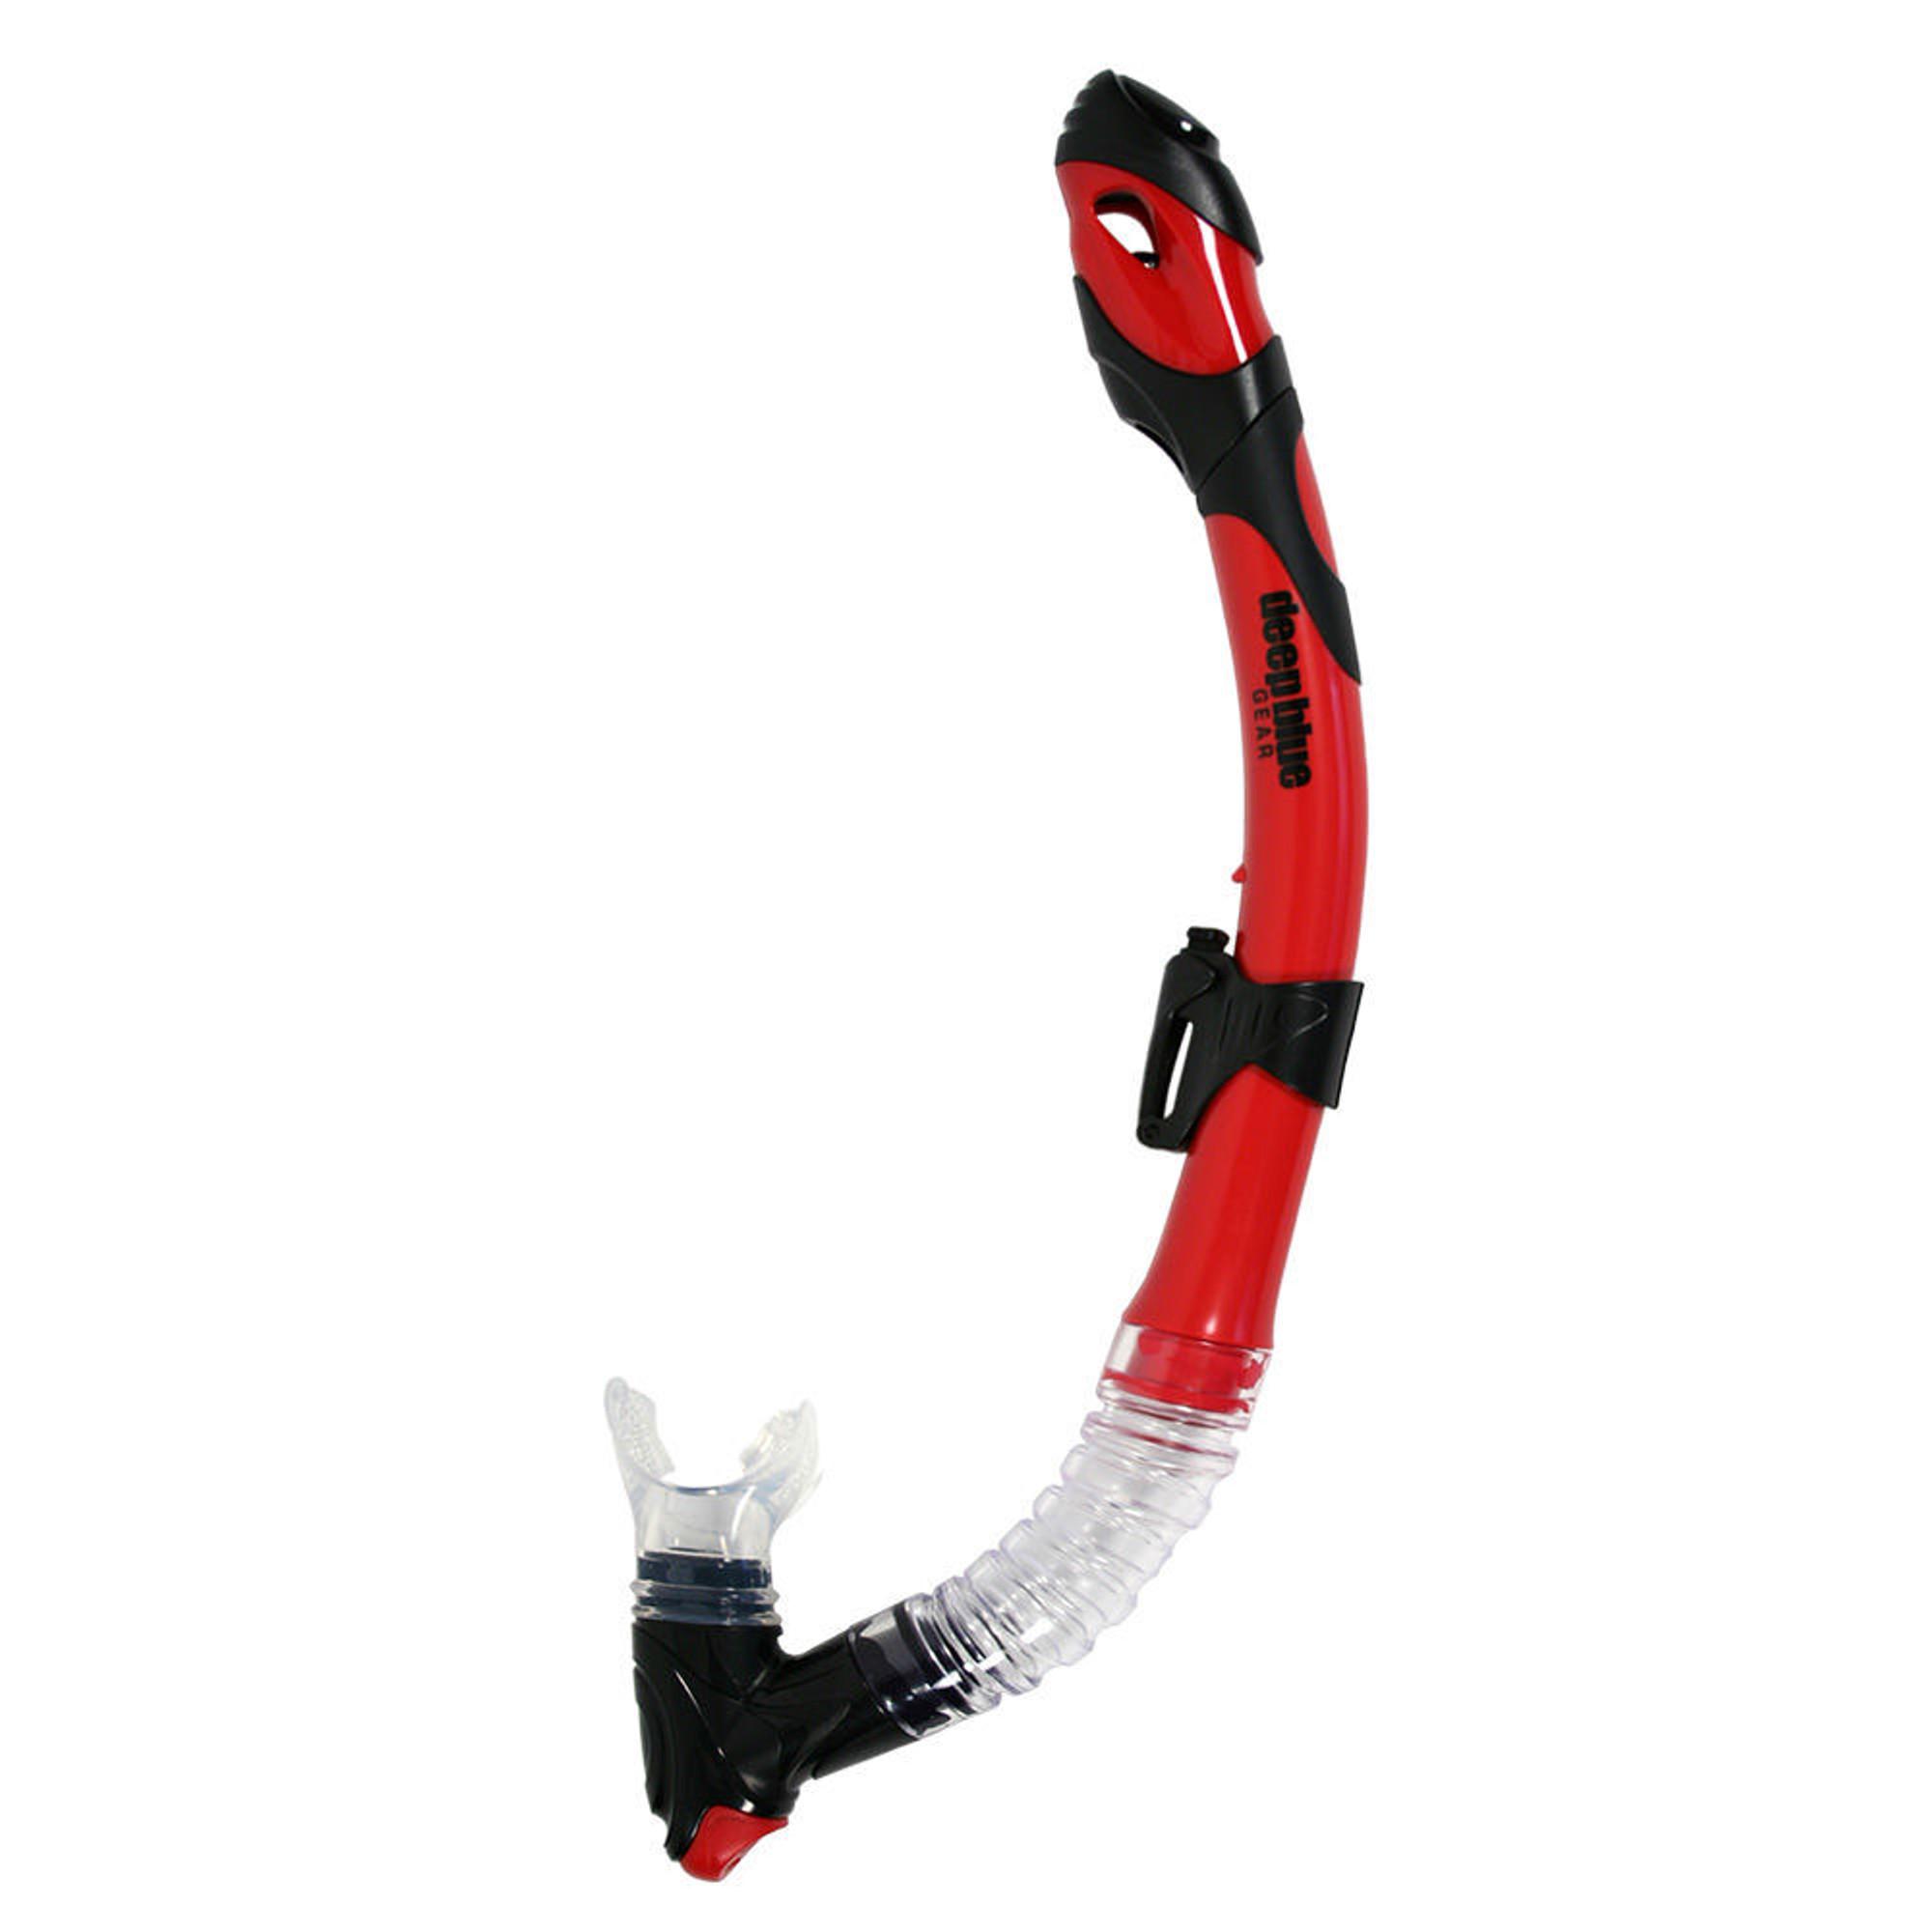 Ultra Dry 2 - Dry Snorkel